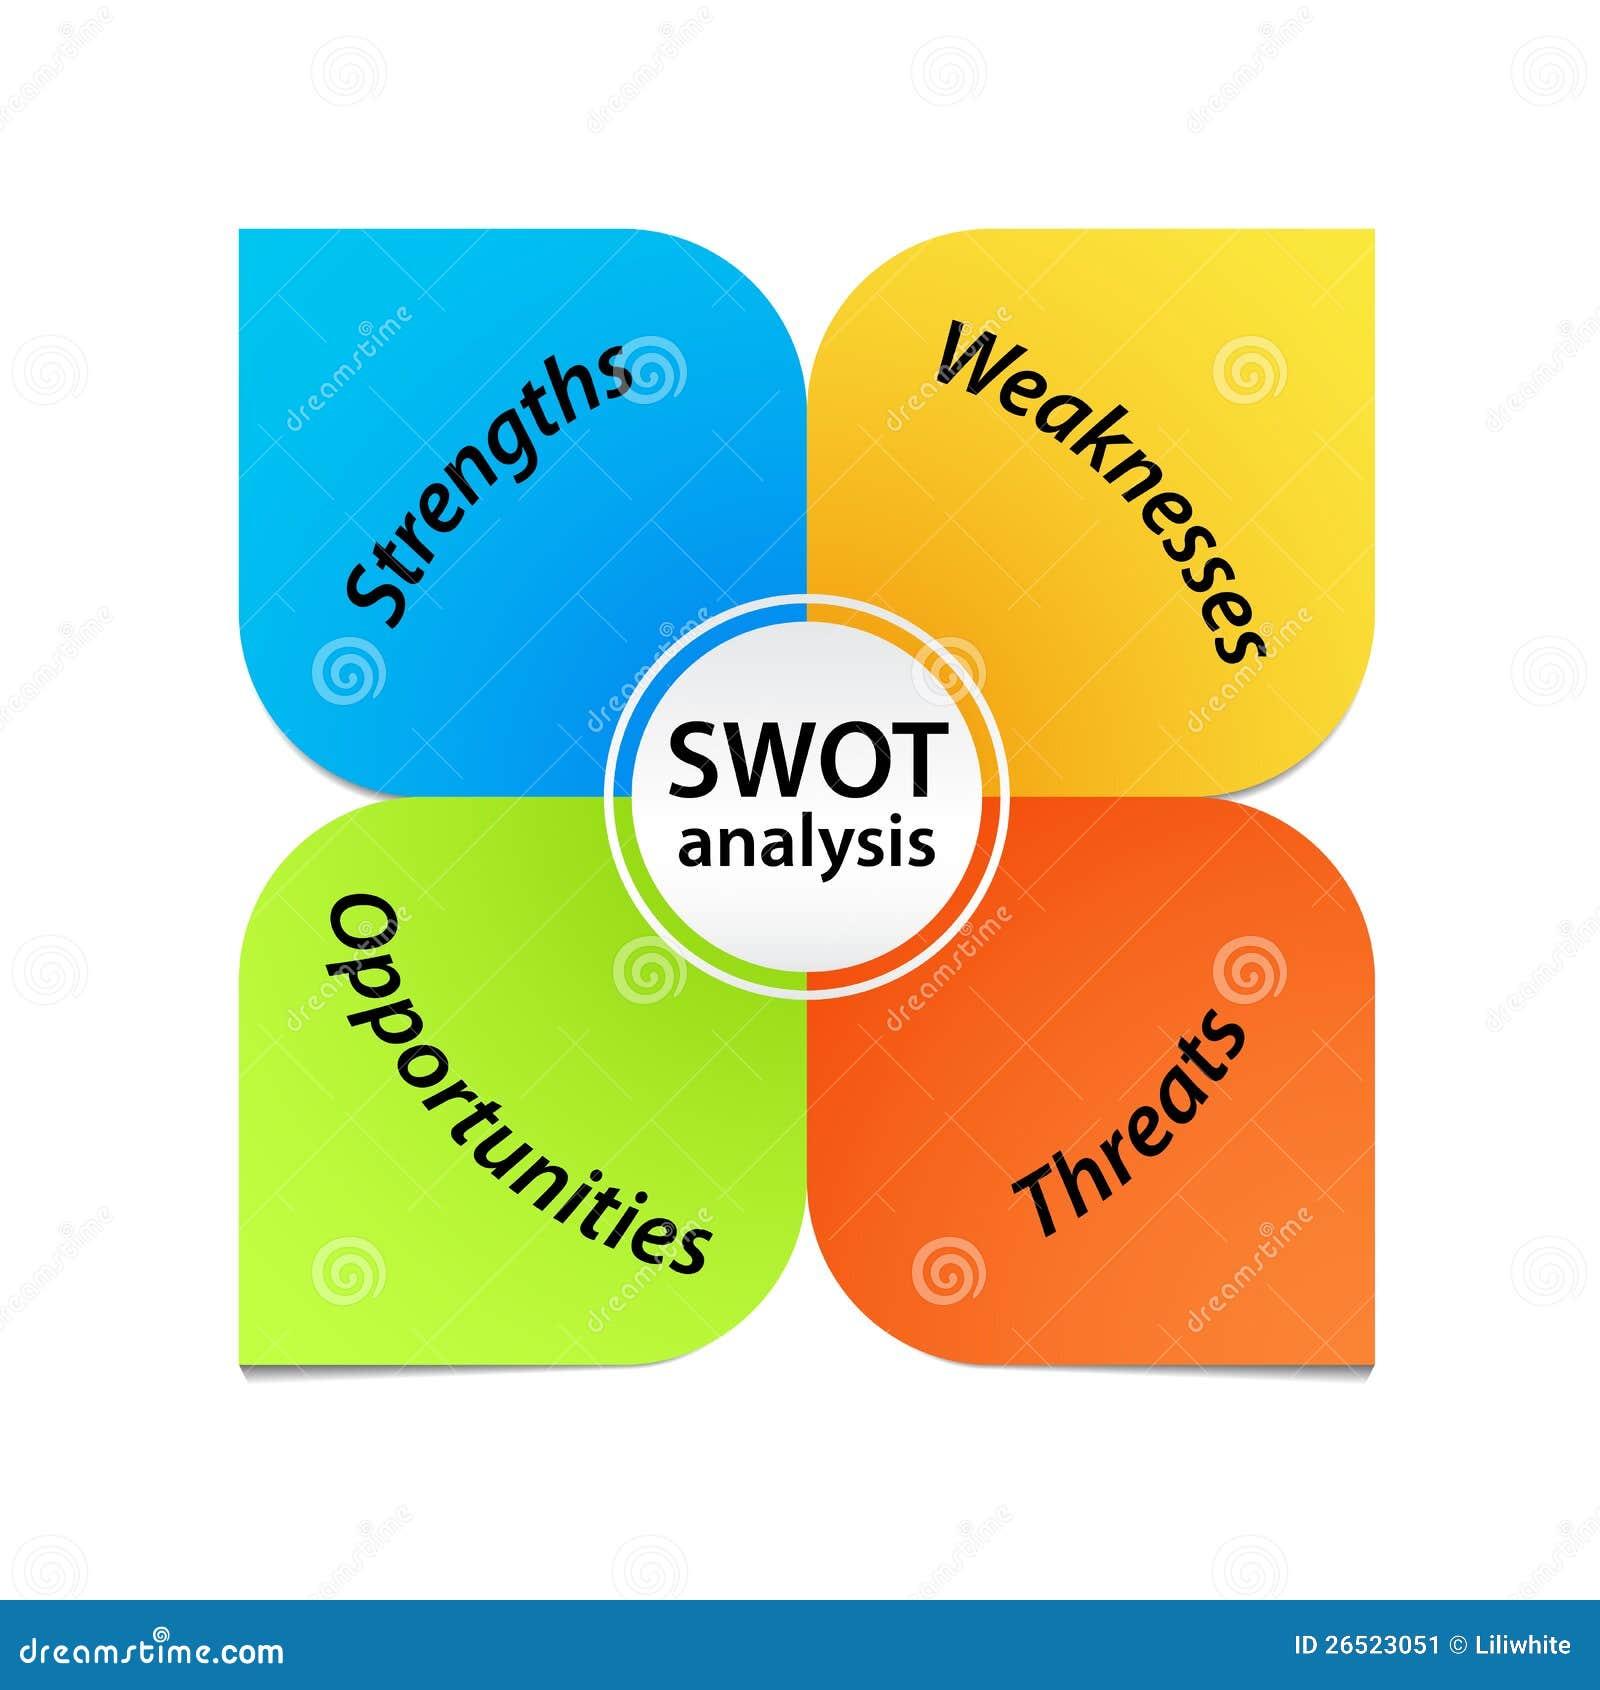 Swot analysis diagram stock illustration illustration of strengths download swot analysis diagram stock illustration illustration of strengths 26523051 ccuart Choice Image